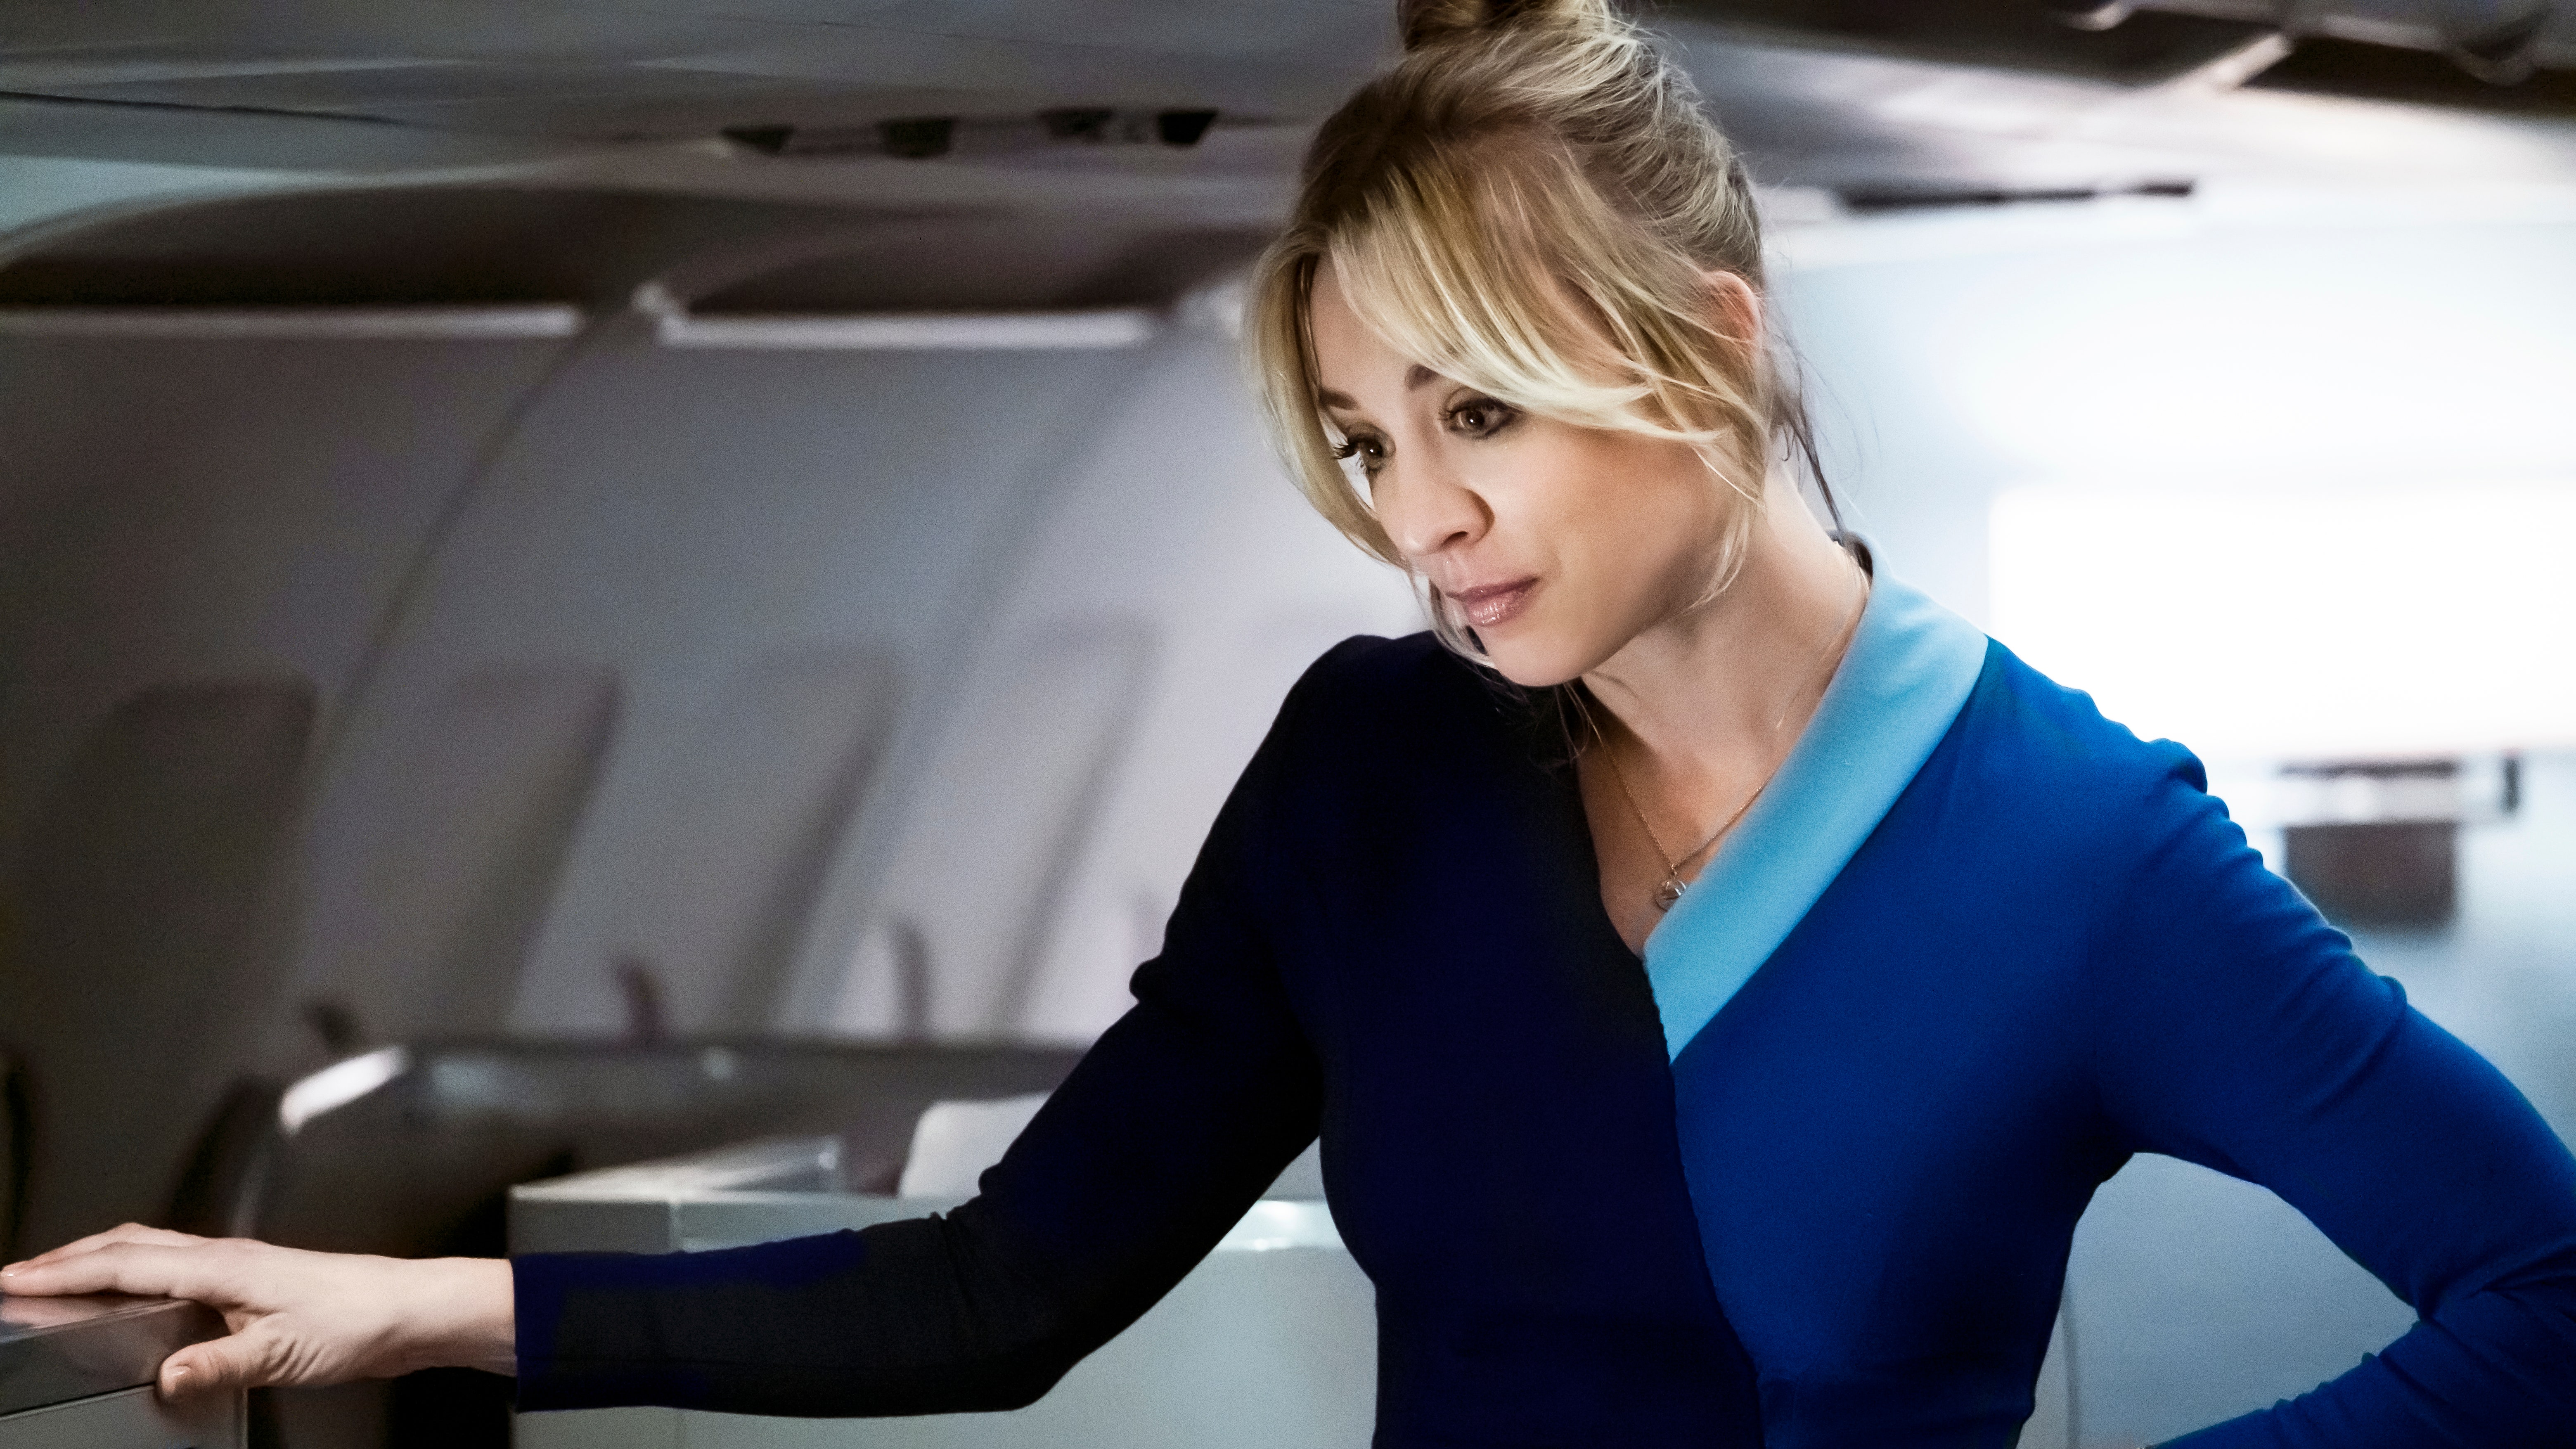 the flight attendant 4k 1602451985 - The Flight Attendant 4k - The Flight Attendant 4k wallpapers